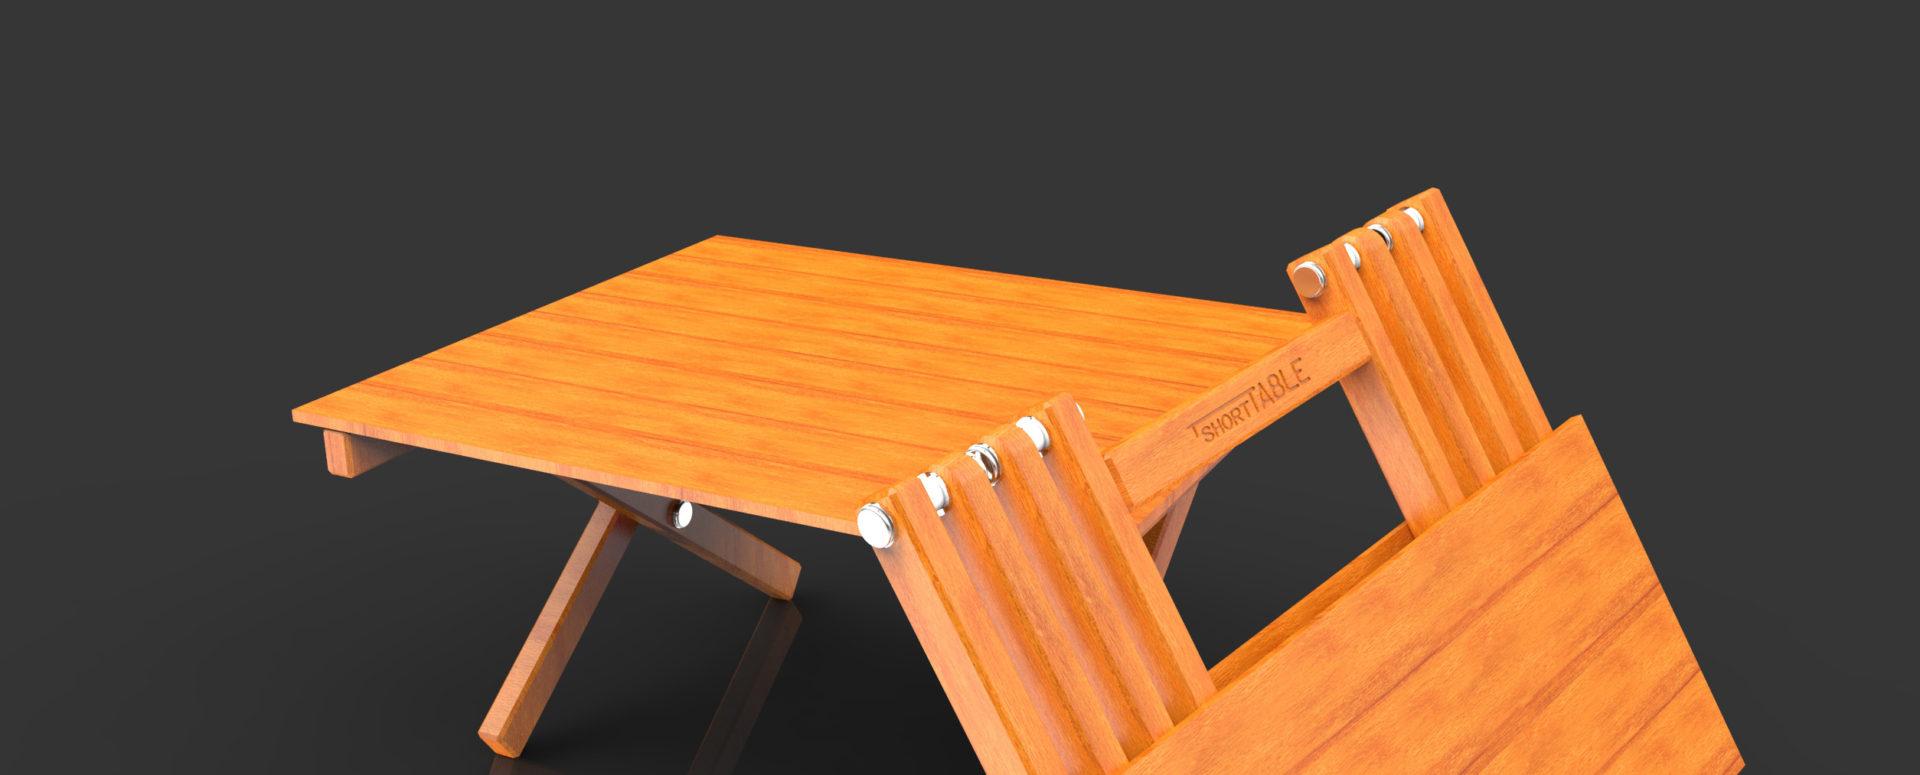 Short Table